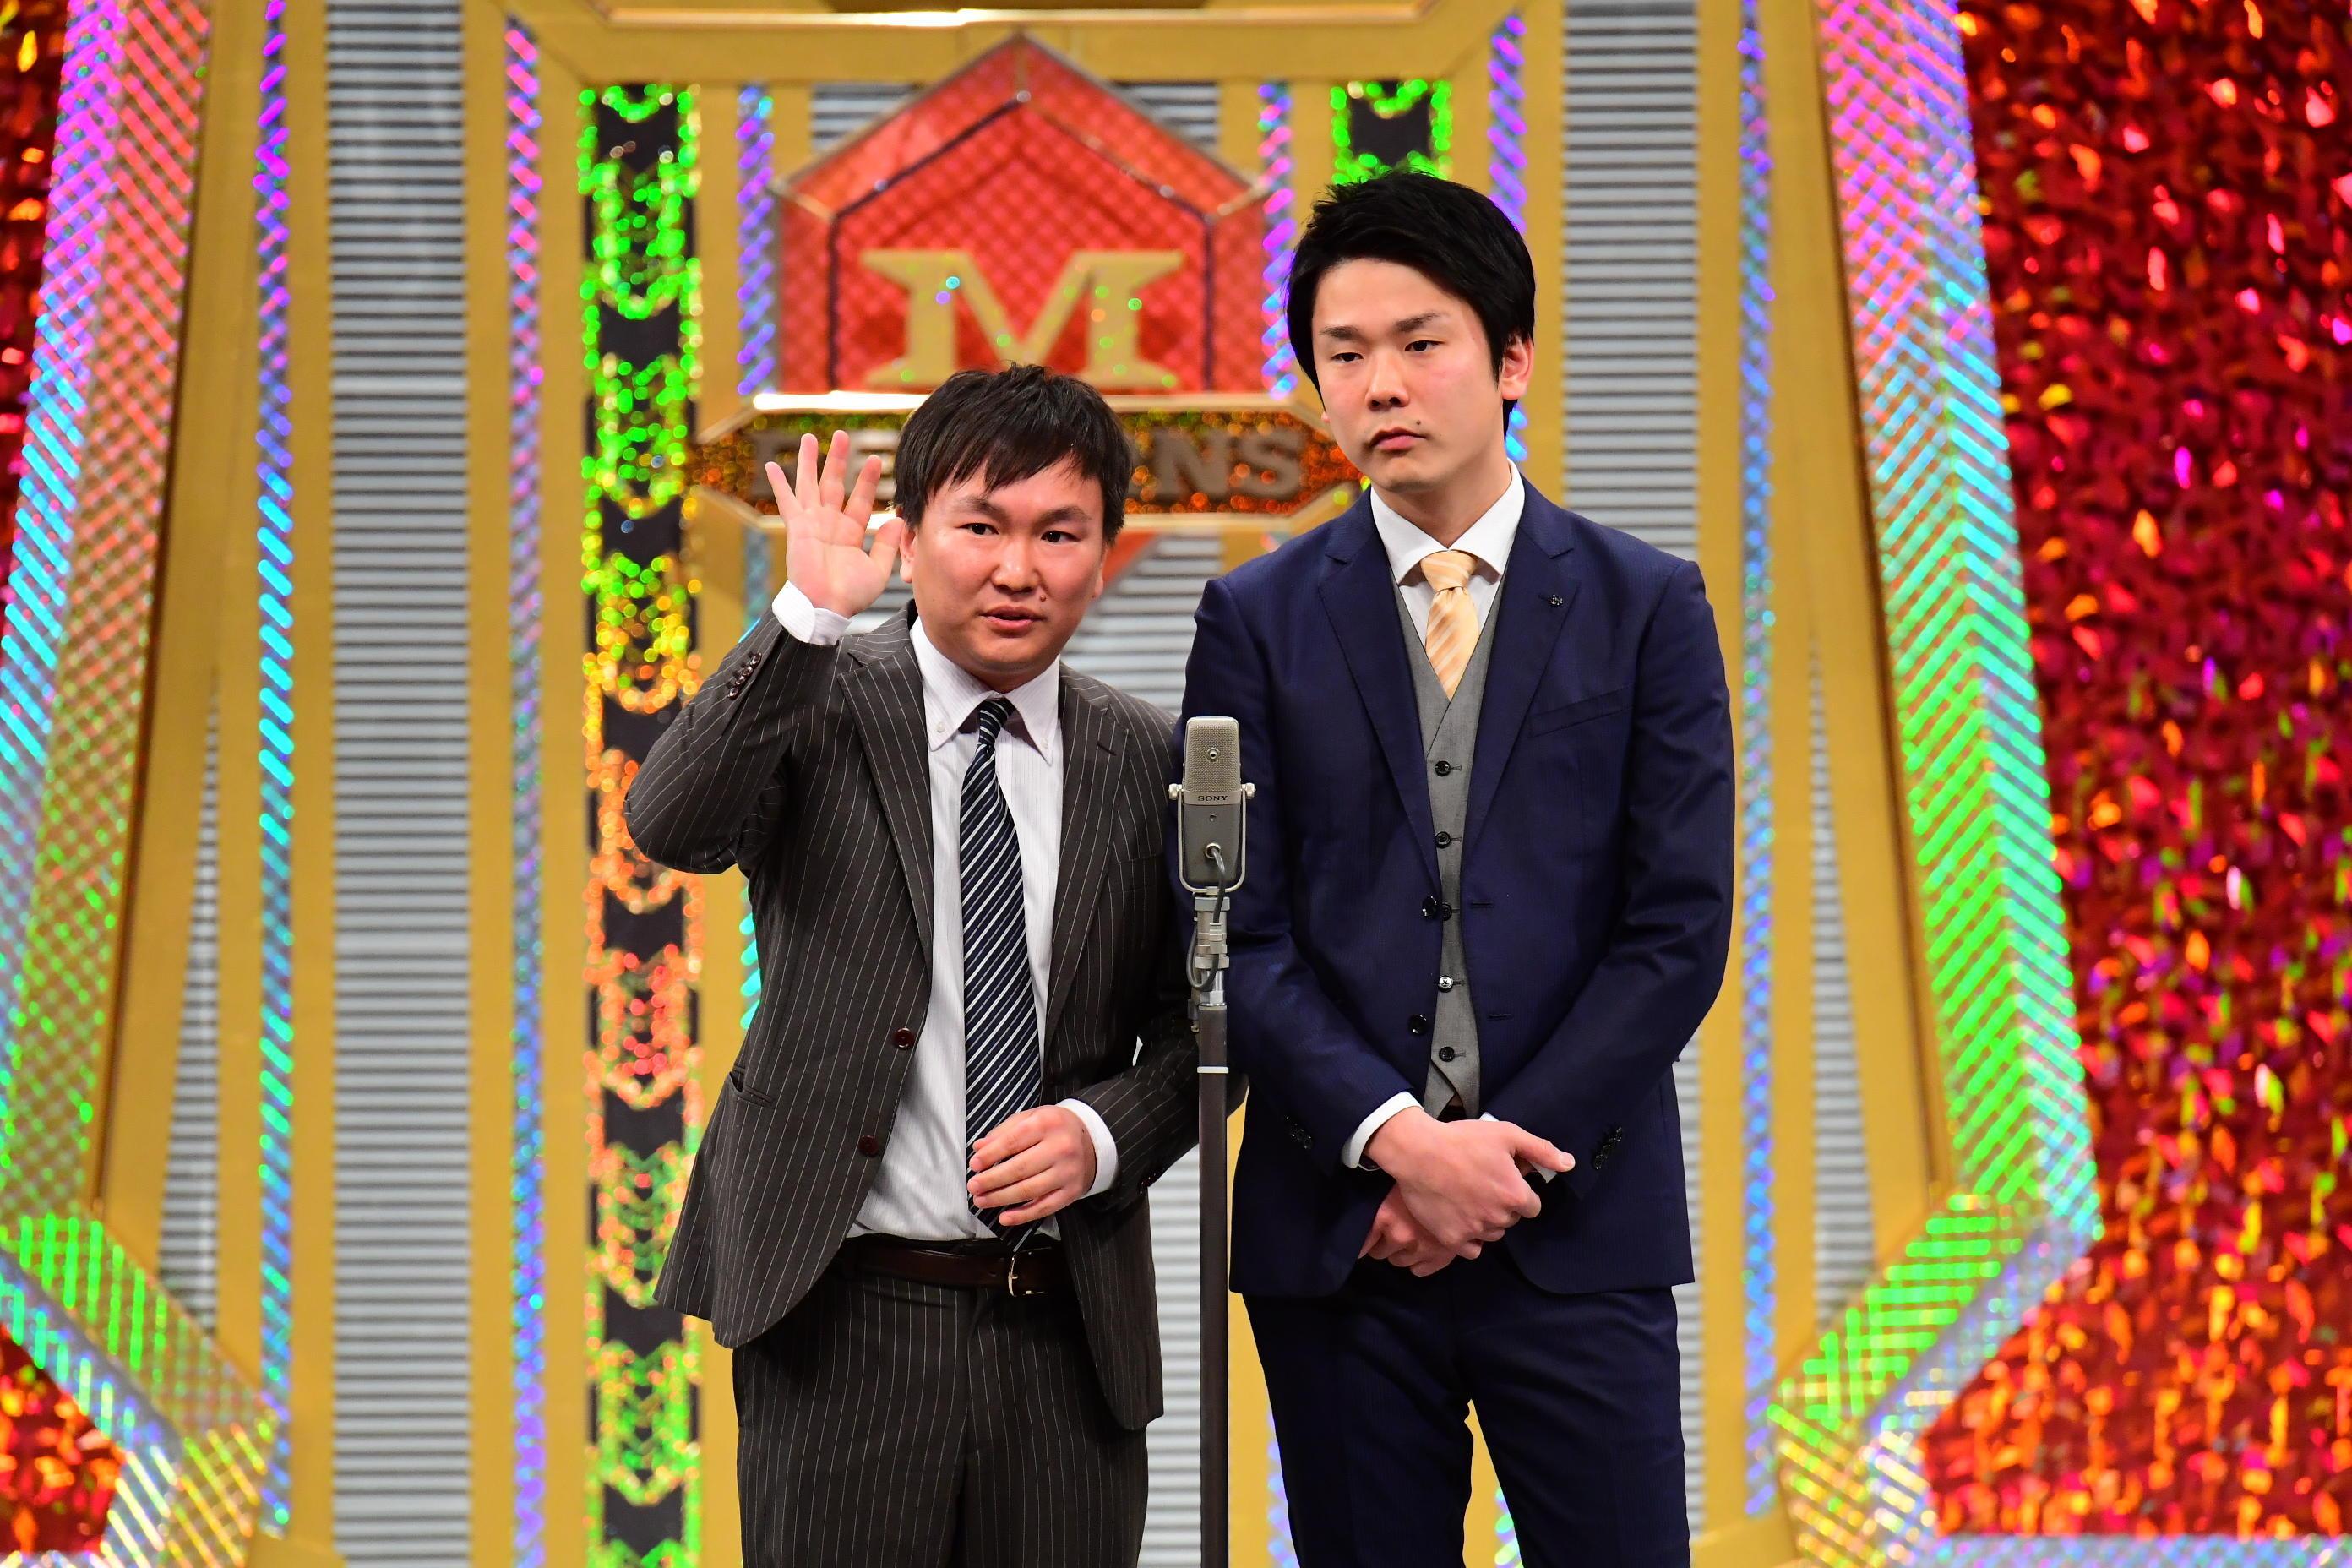 http://news.yoshimoto.co.jp/20170228155441-f3adf3d03c25eb8916087182c6b4522abdb07f16.jpg